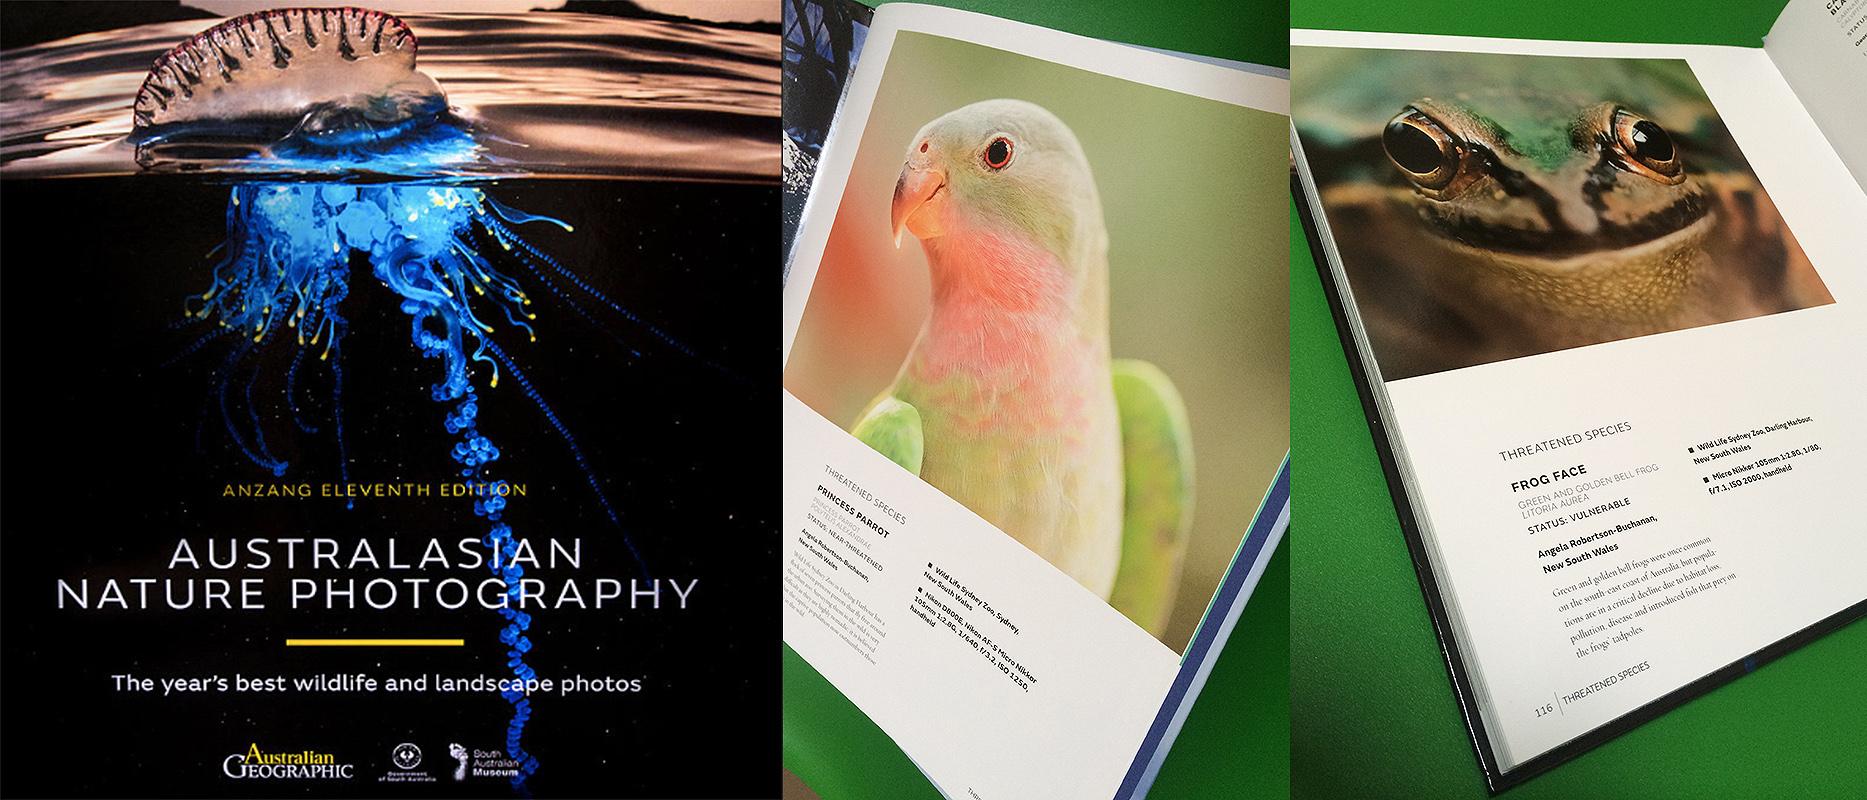 Australian Geographic Book